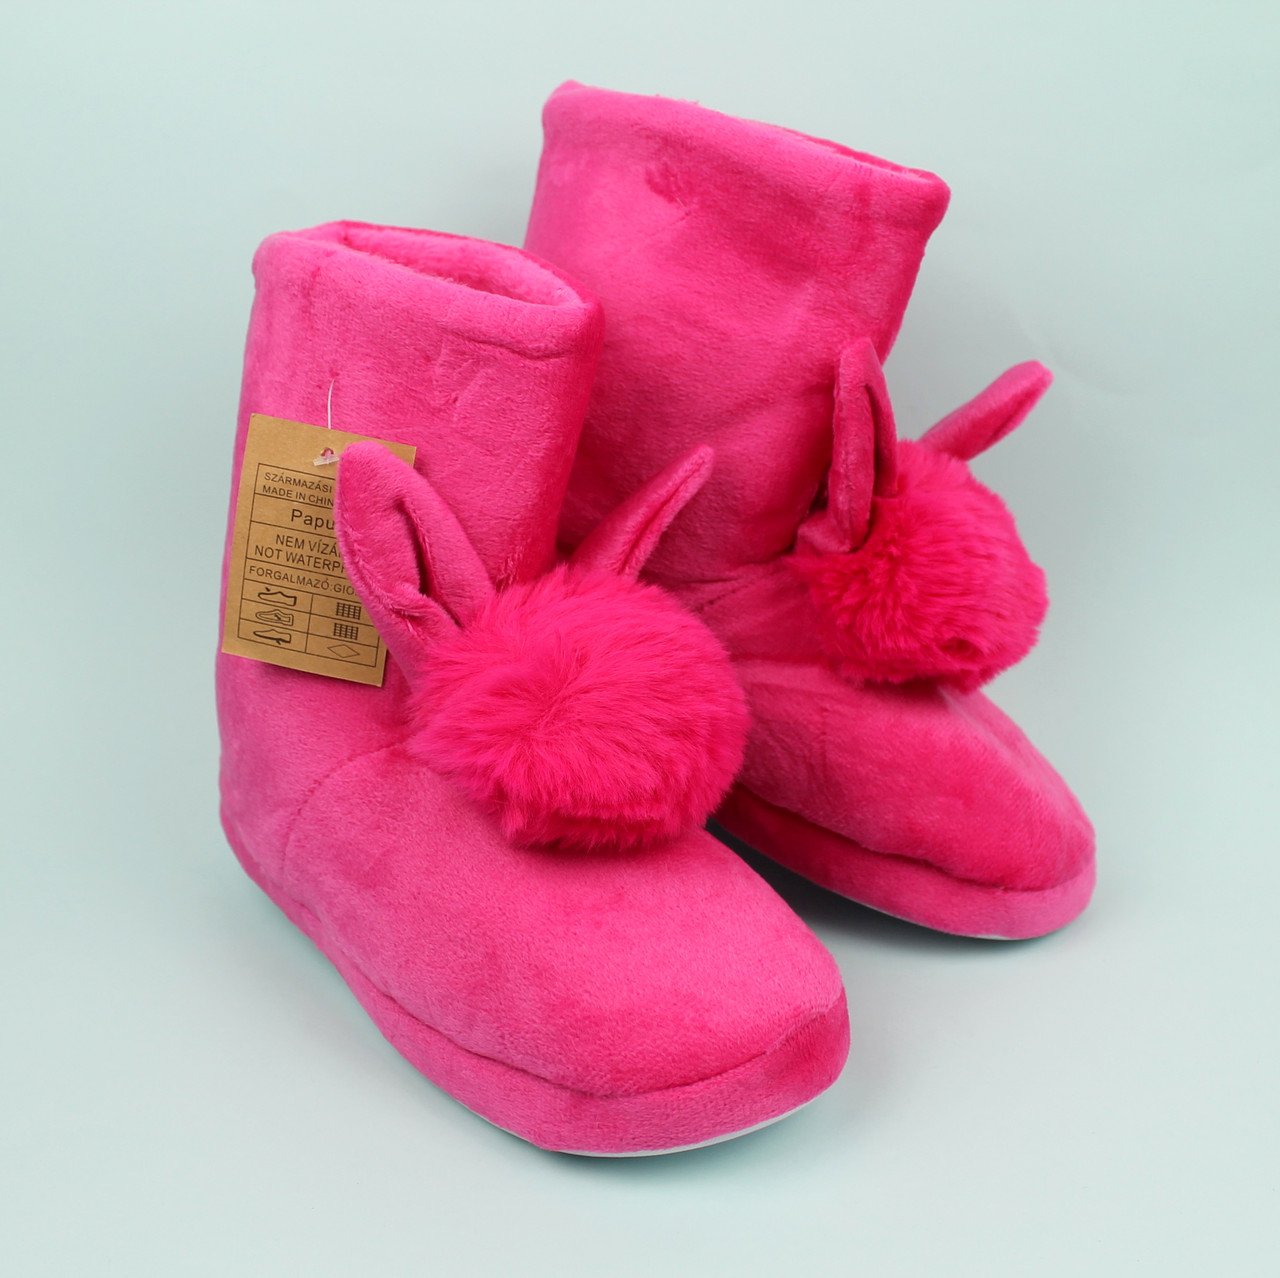 Плюшевые тапочки сапожки для девочки Ушки тм Giolan размер 36-37,40-41